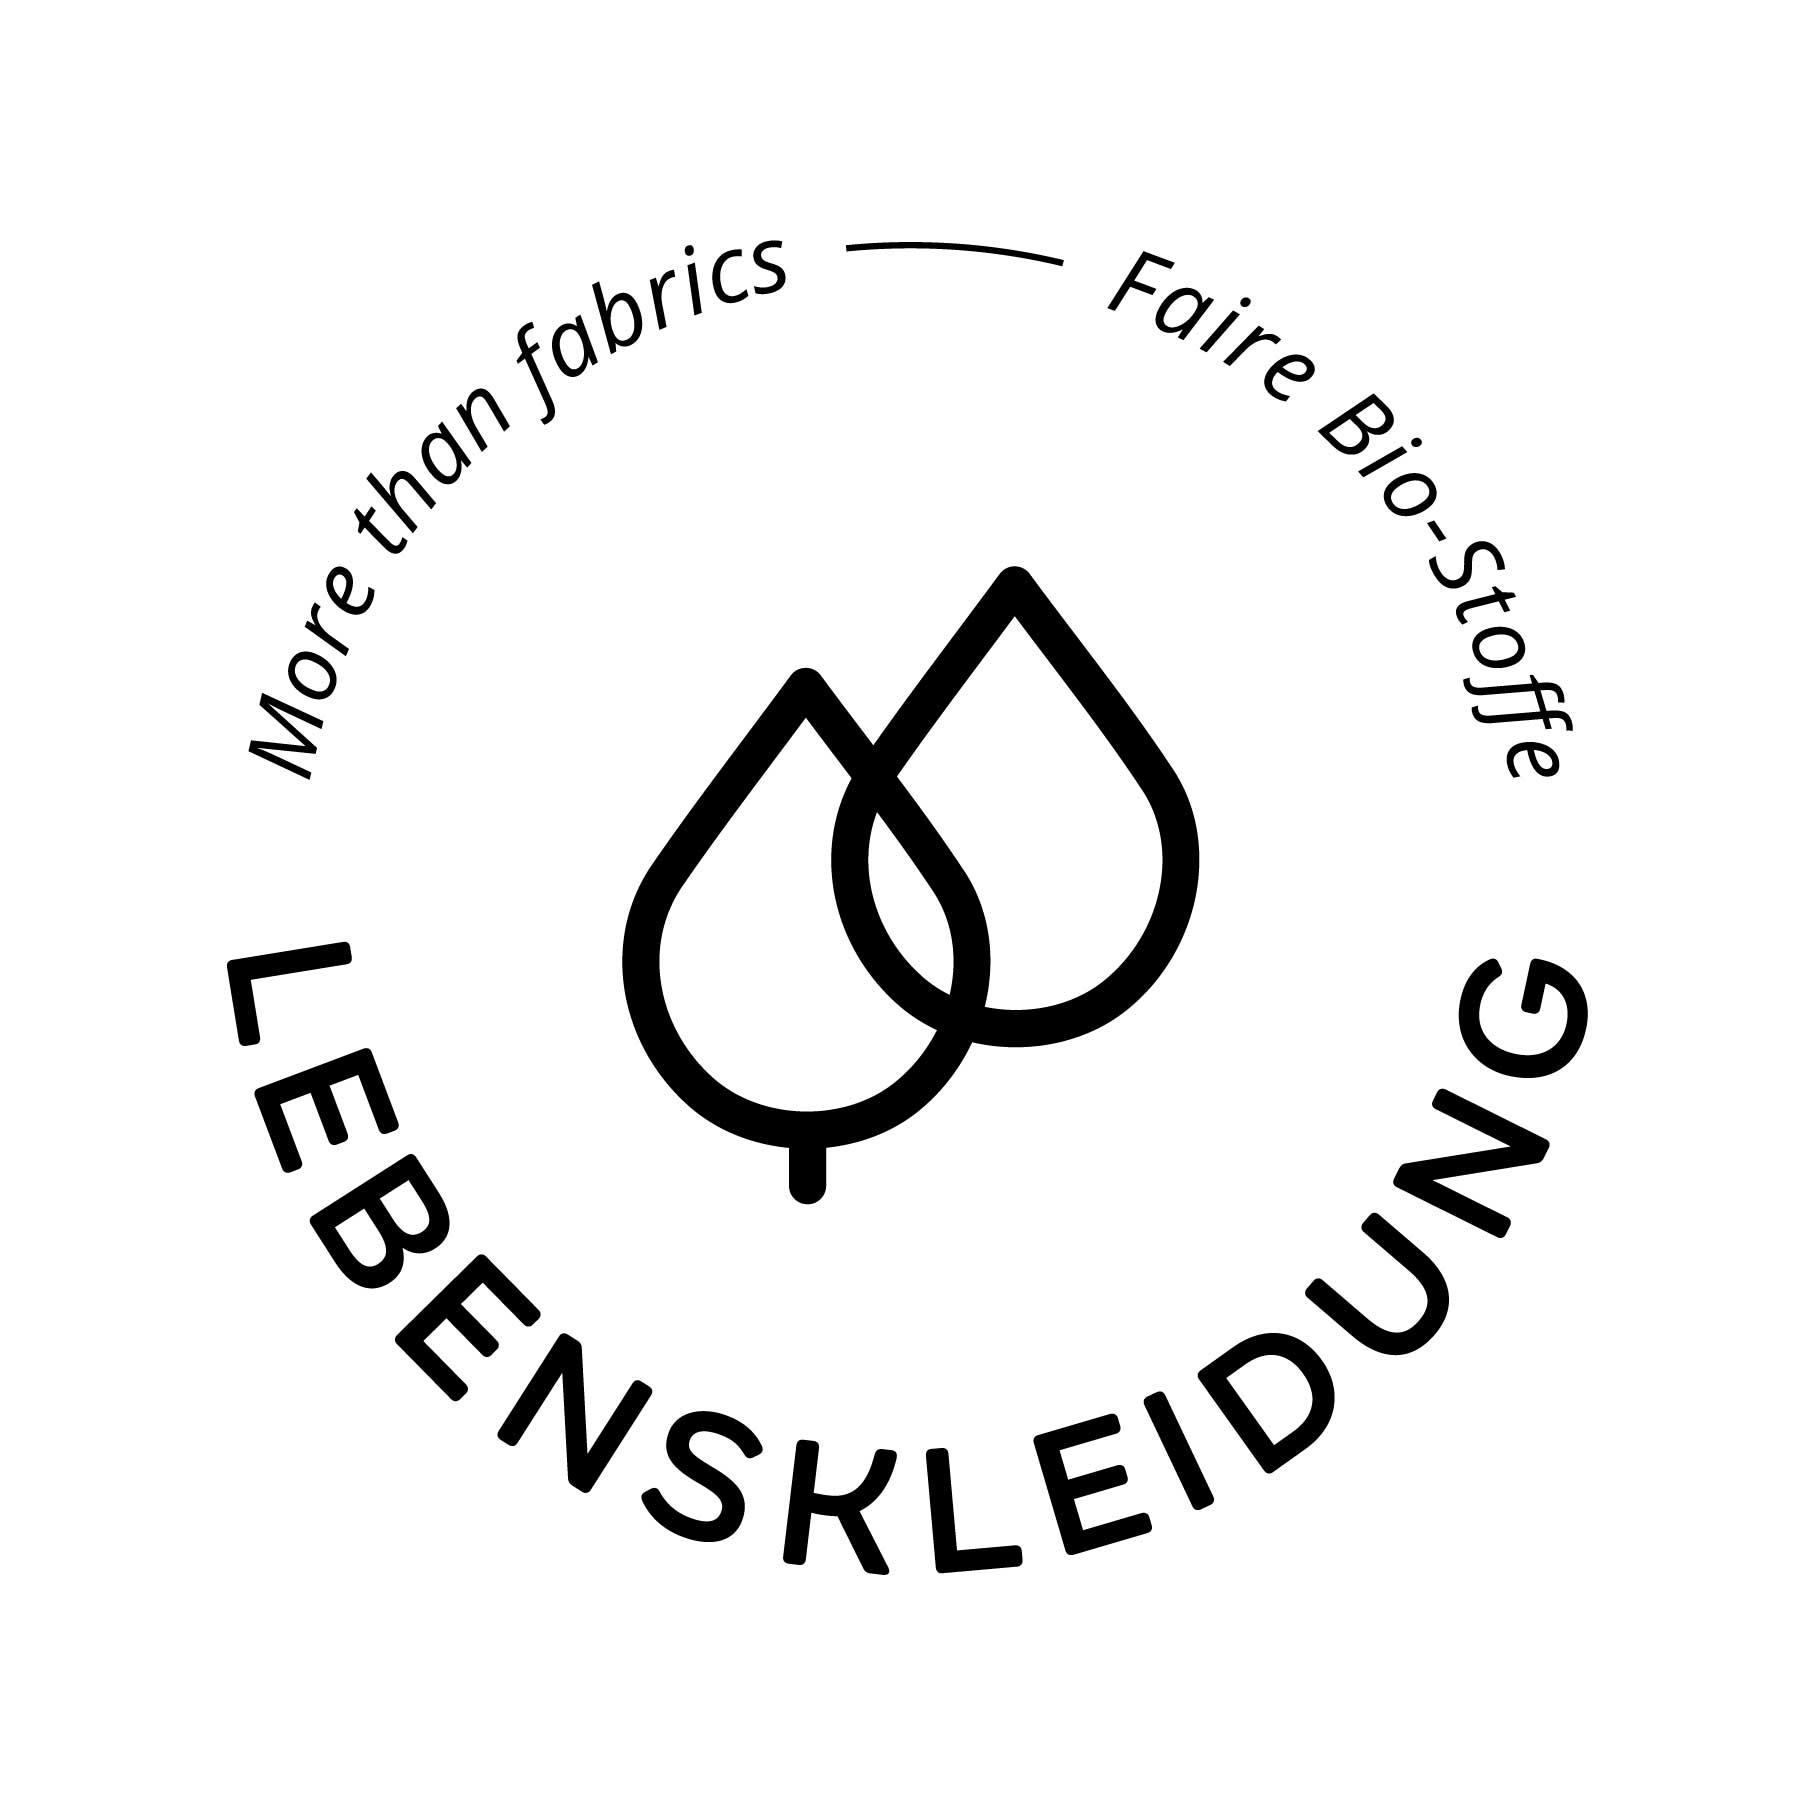 Tela orgánica Cordón - 100% algodón orgánico controlado orgánico -  para telas livianas y pesadas. - 7 mm -  Negro  - 100 Metros